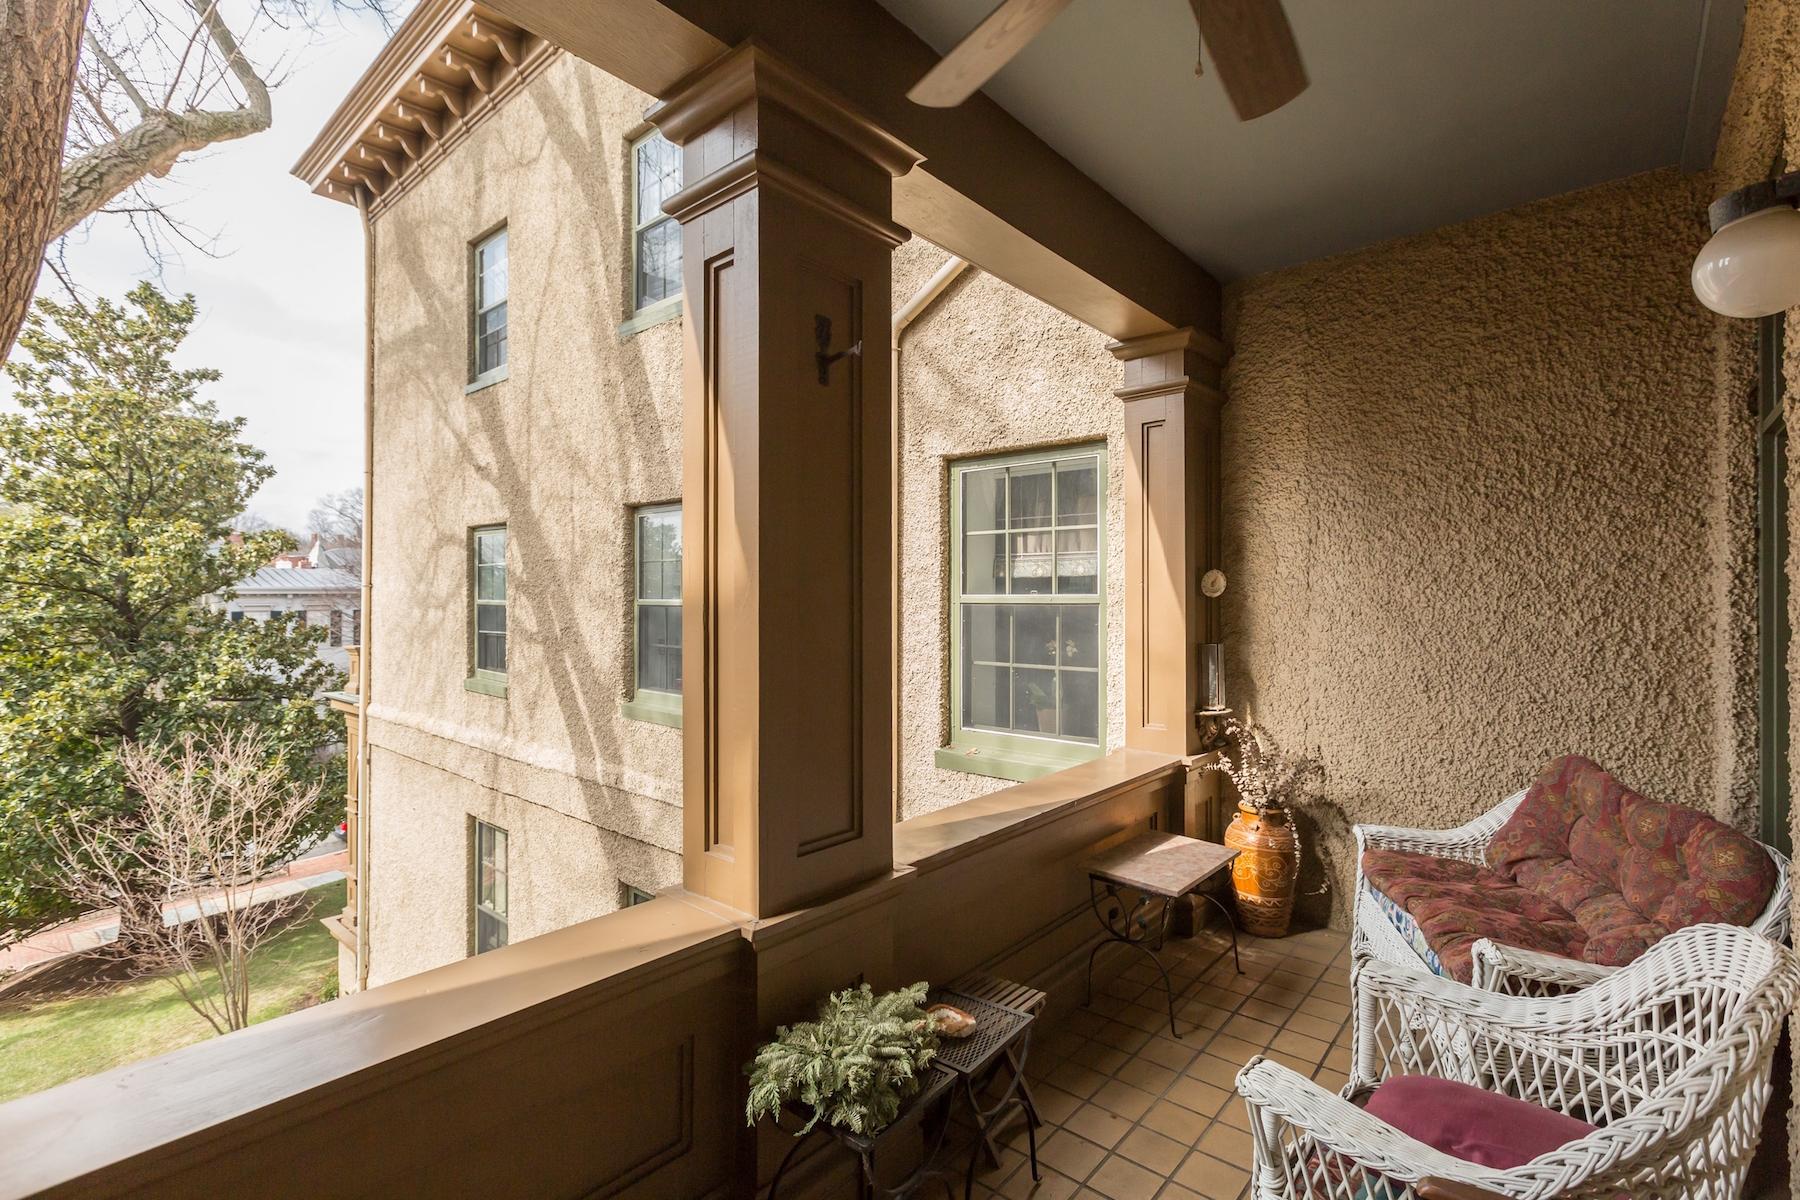 Additional photo for property listing at Rarely Available: Historic Georgetown Condominium 1527 30th St B21 Washington, Περιφερεια Τησ Κολουμπια 20007 Ηνωμενεσ Πολιτειεσ